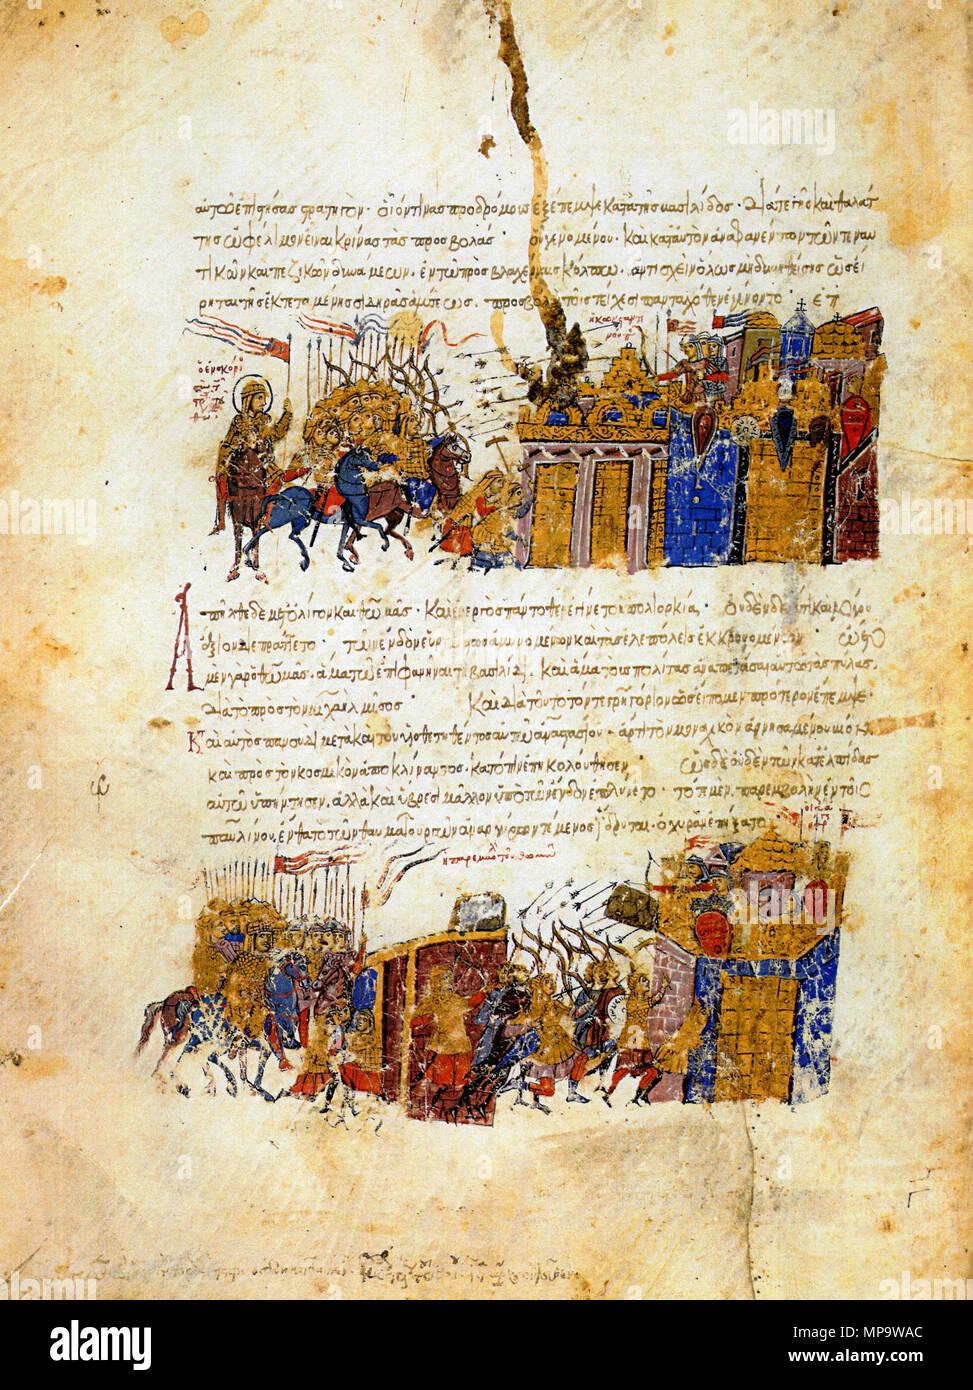 Nutten Konstantinopel